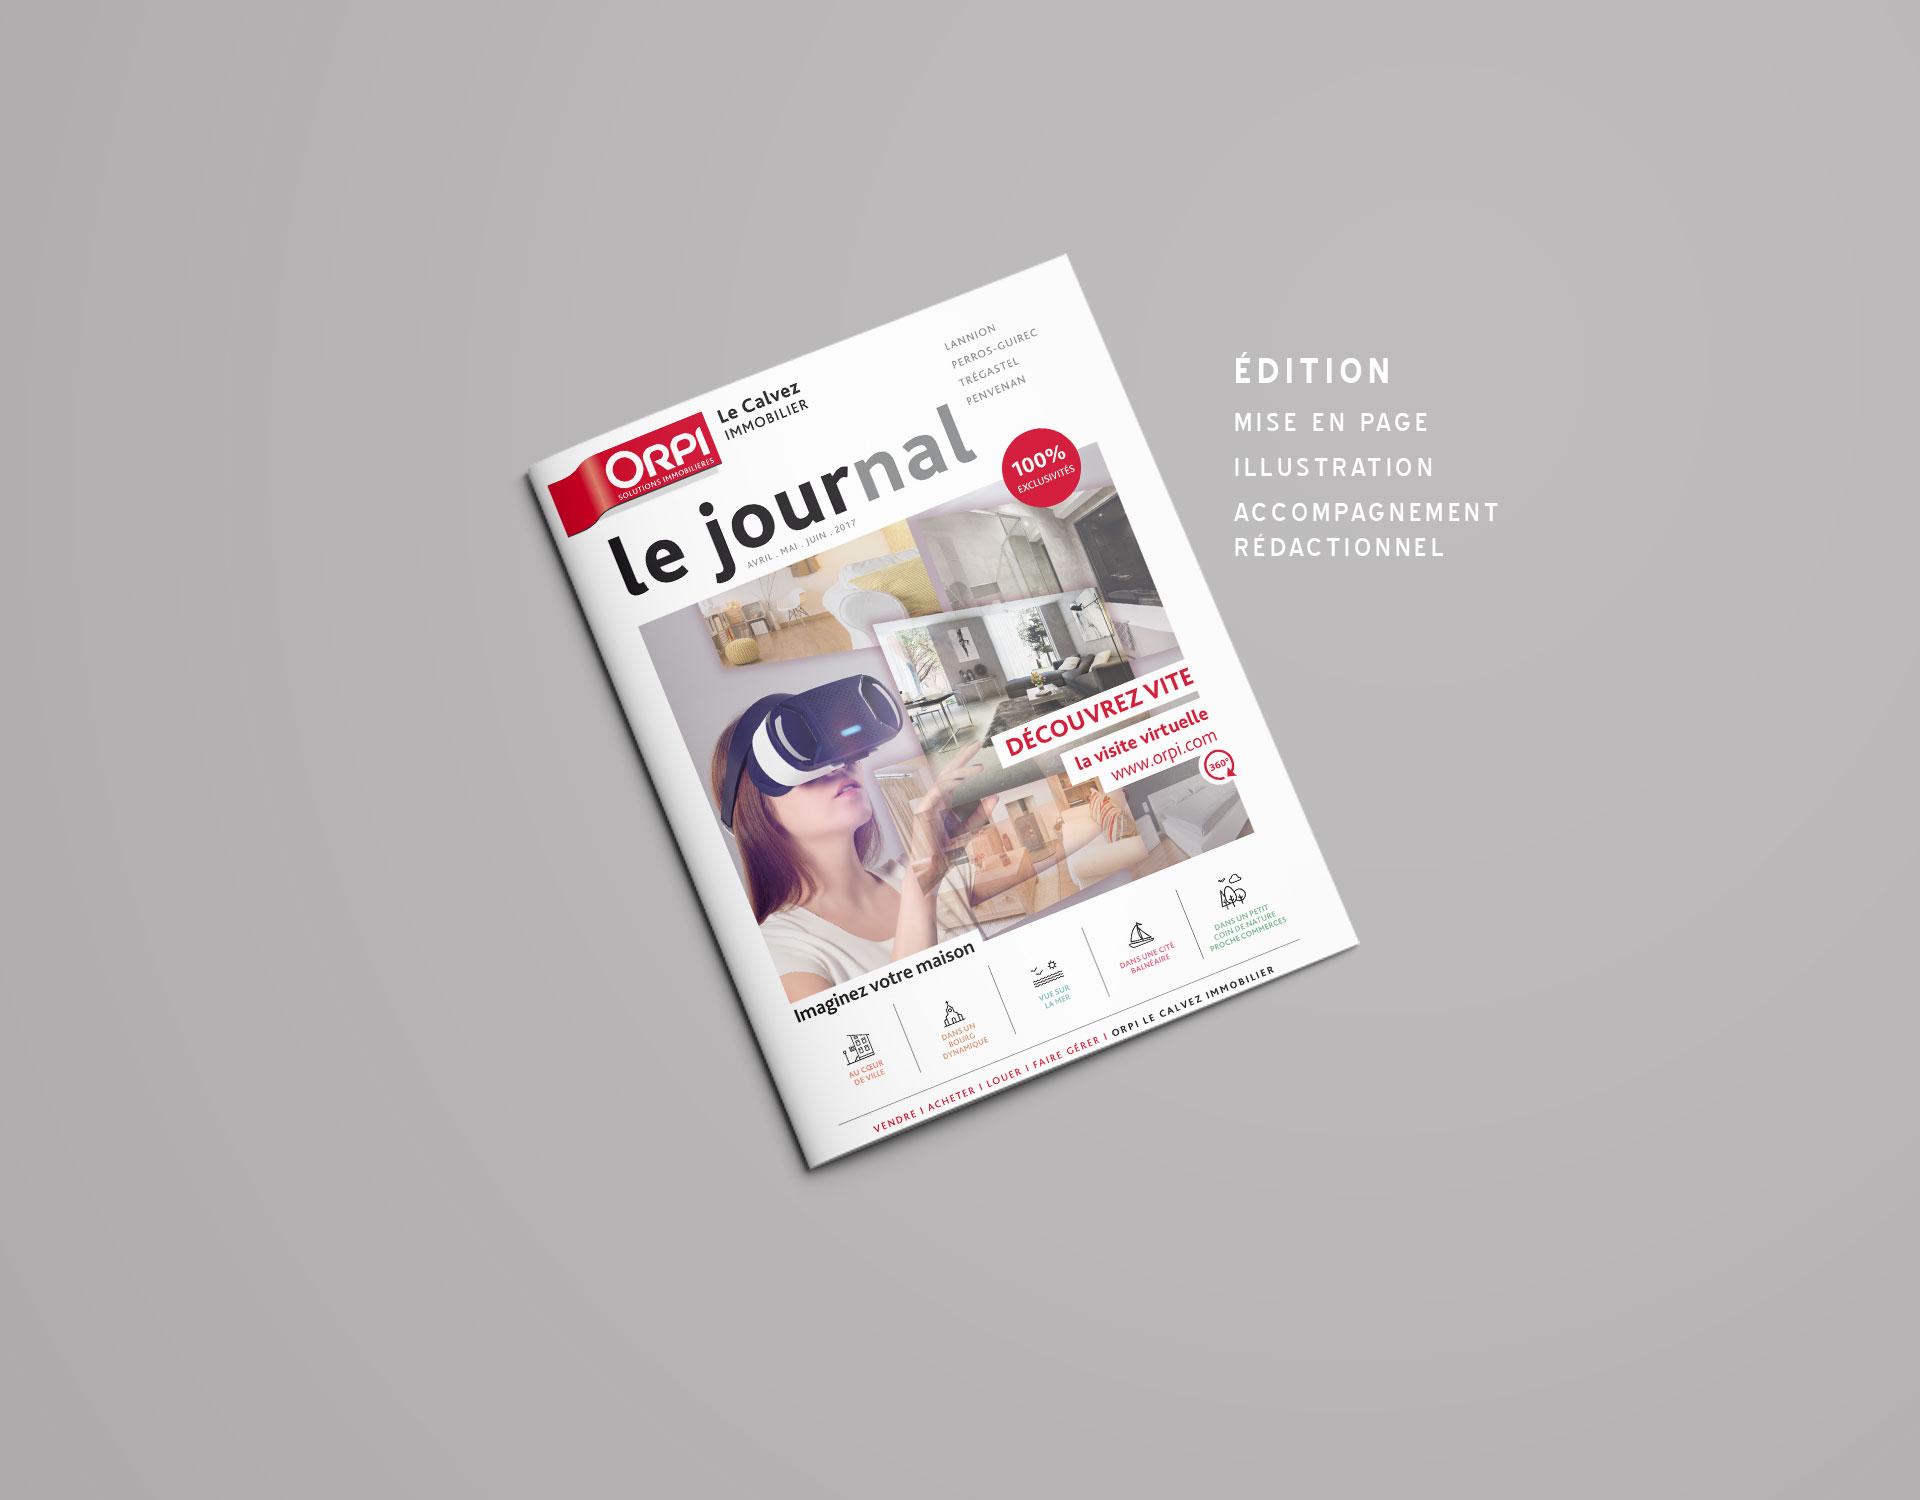 ORPI- Journal des exclusivités by Coqueliko